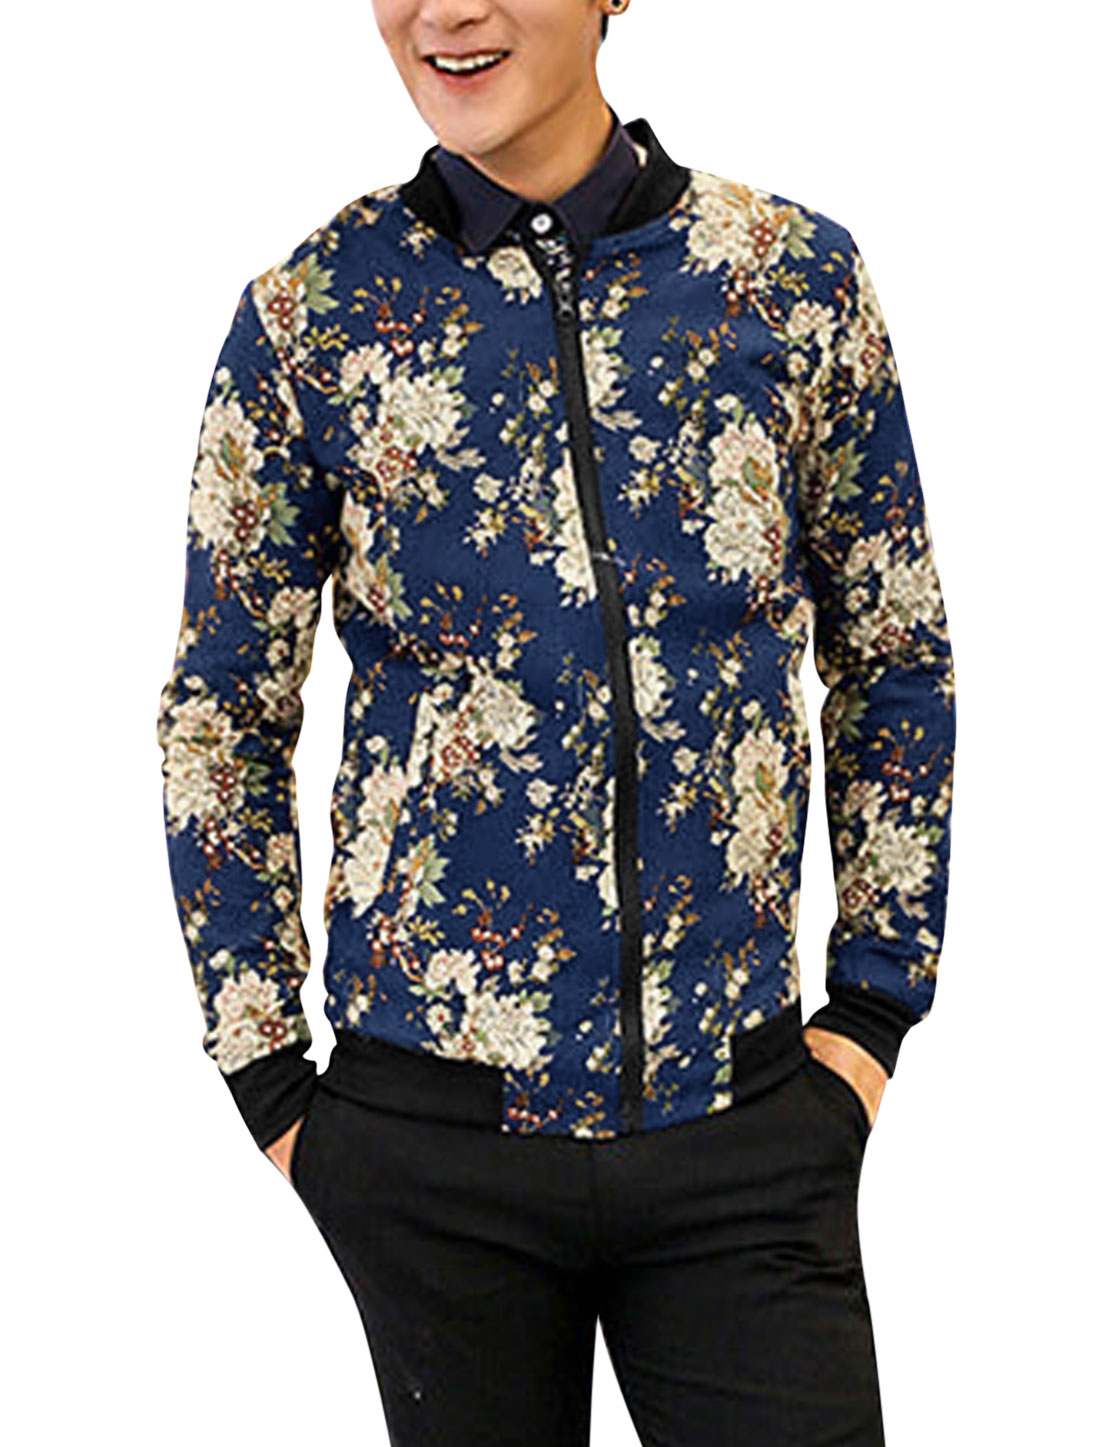 Men Zip Up Double Slant Pockets Trendy Casual Jacket Navy Blue S